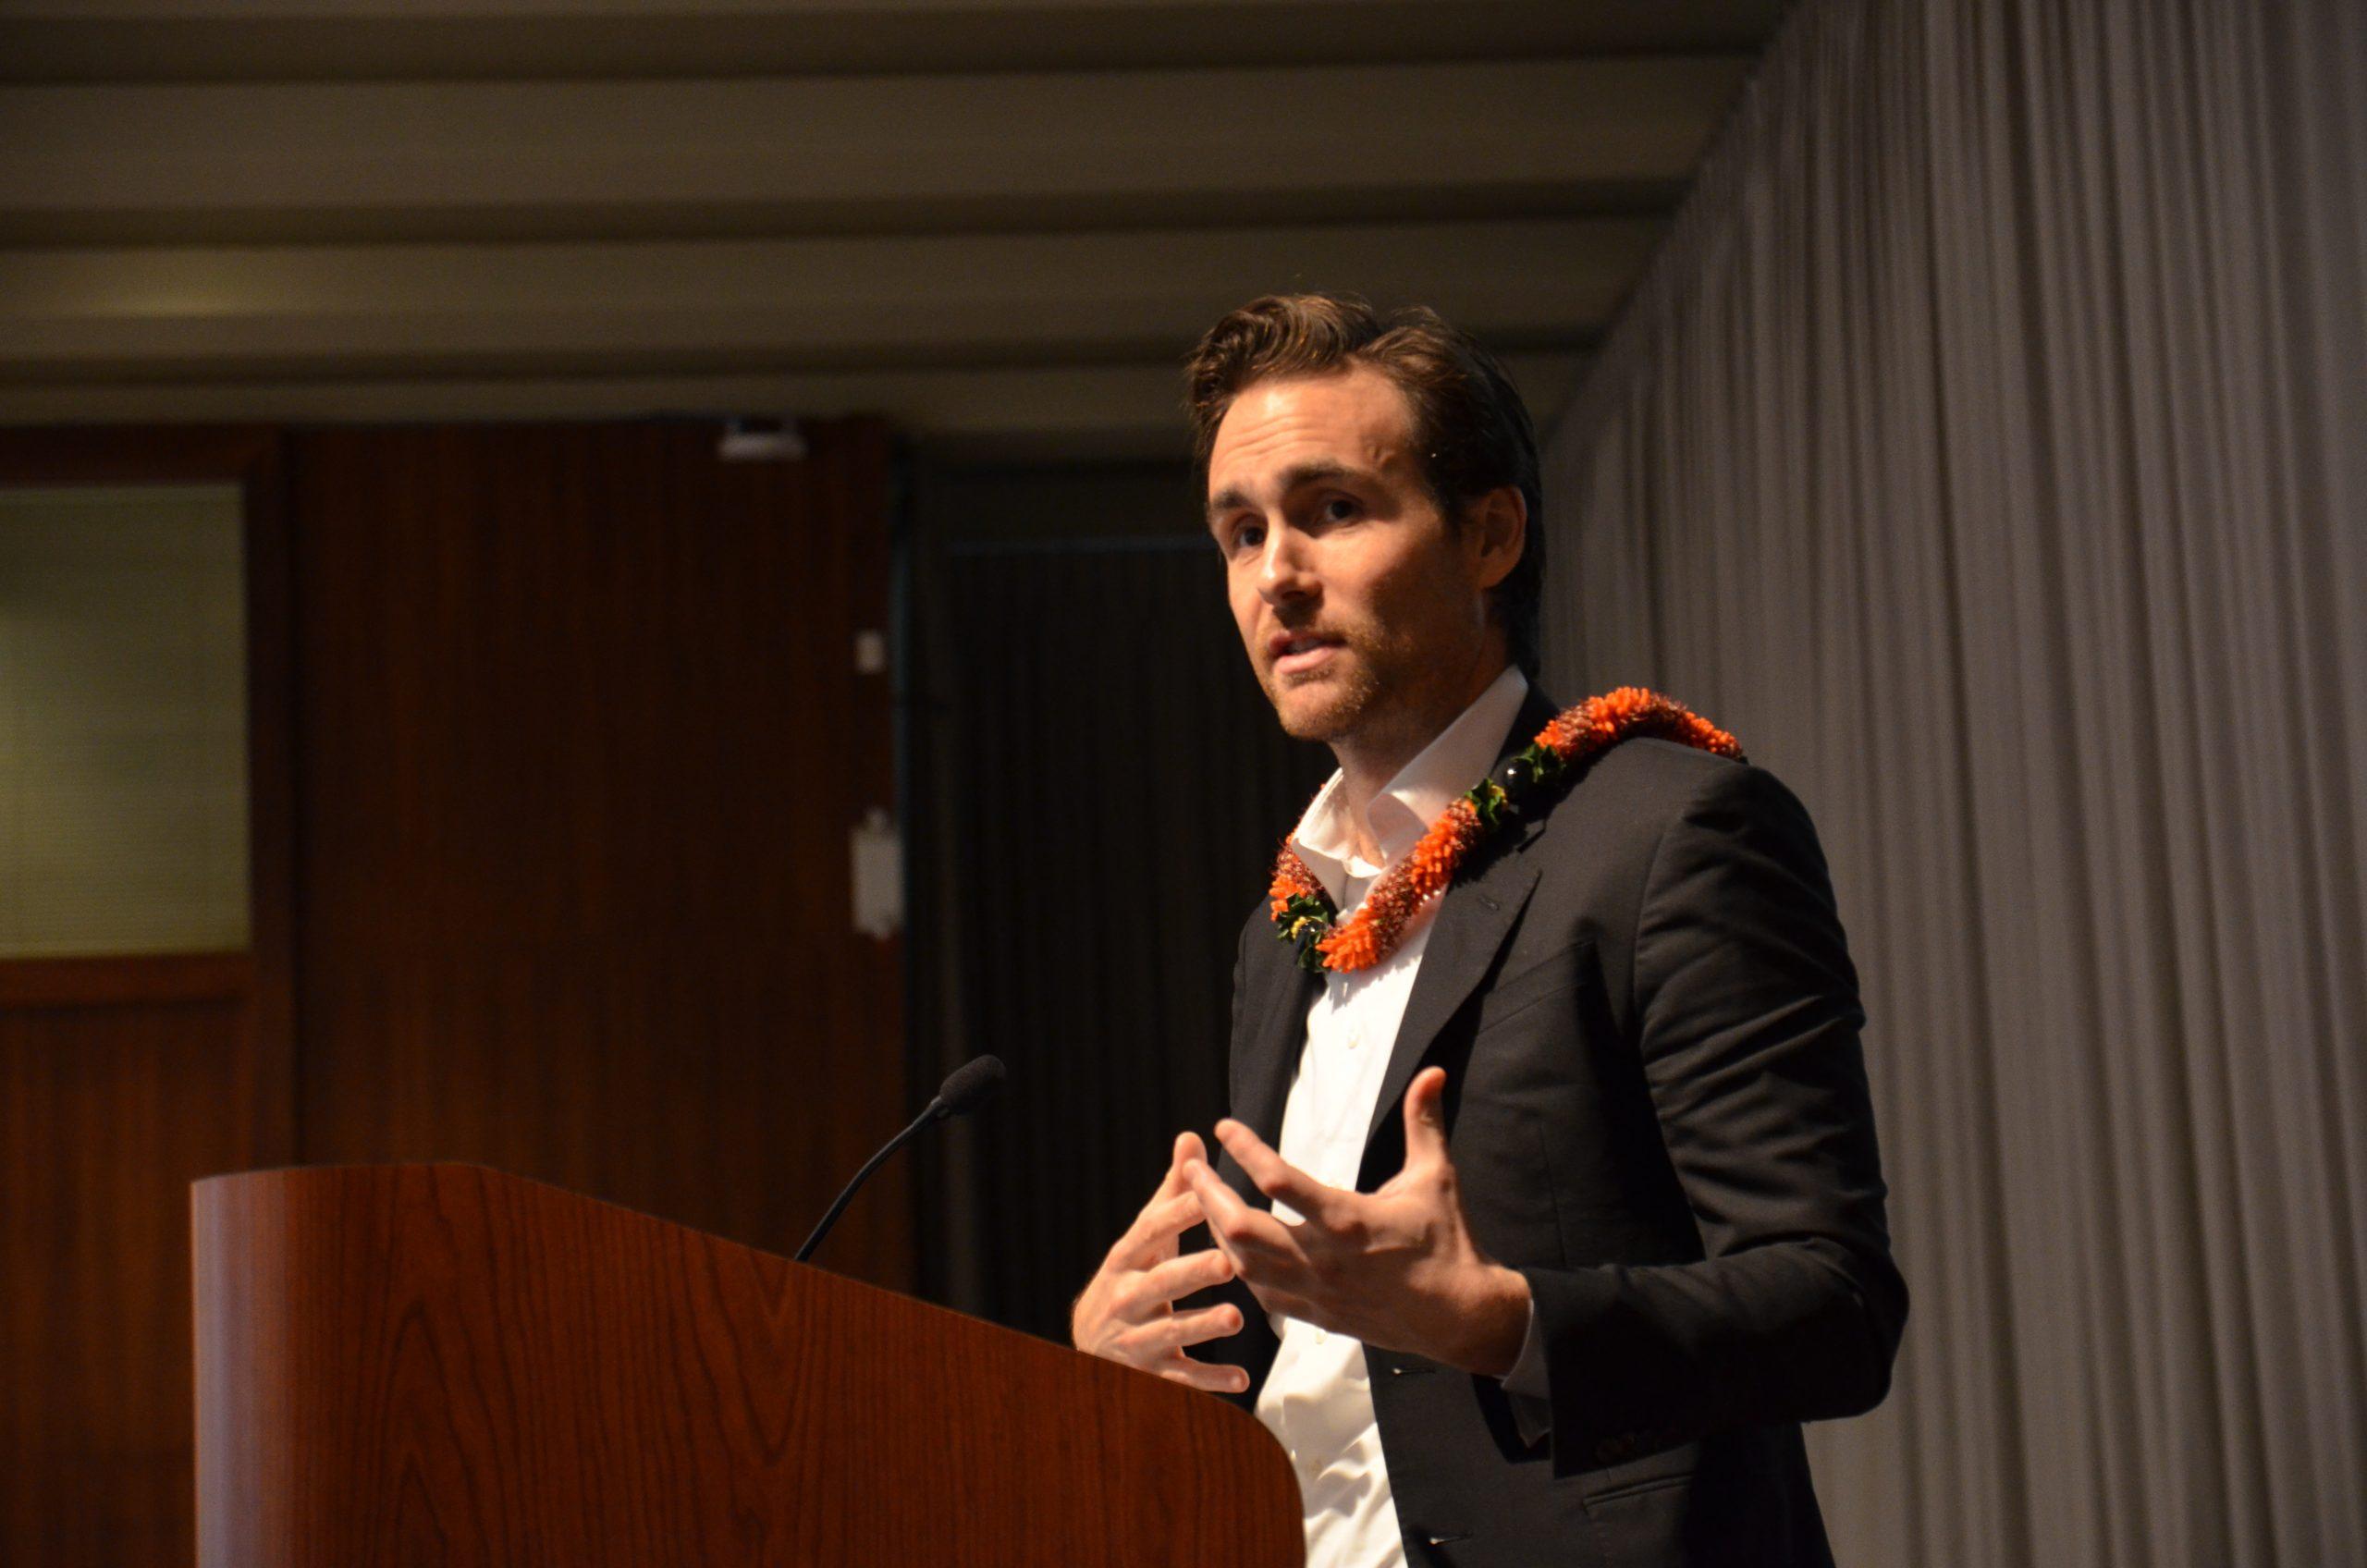 Keynote Address by David Wallace Wells